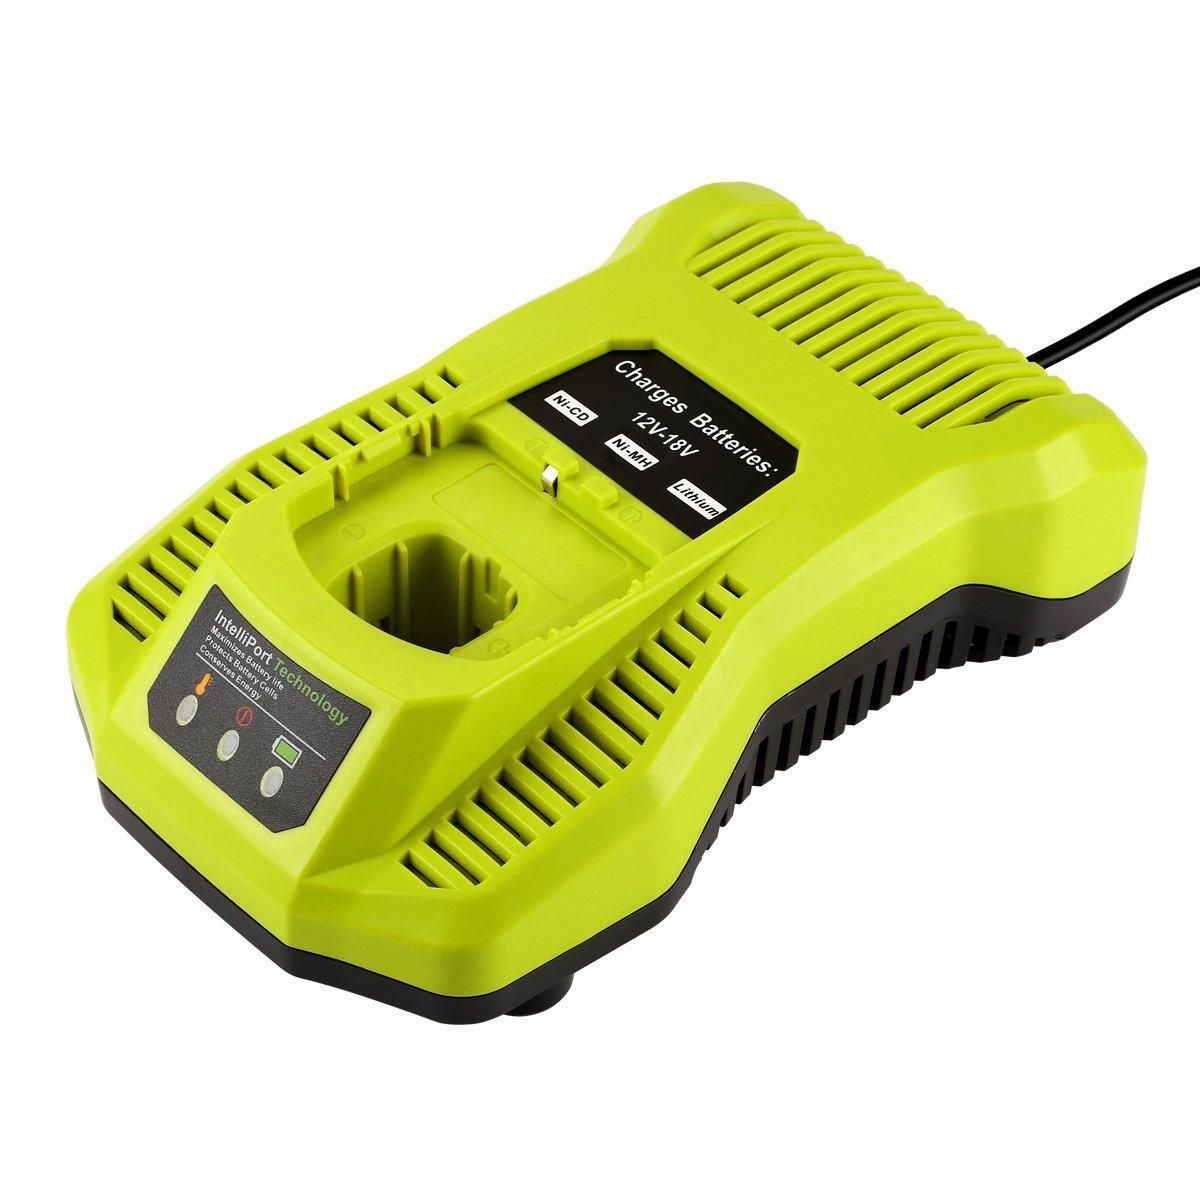 For Libybi RYOBI P117 12V 18V nickel / lithium battery universal charger